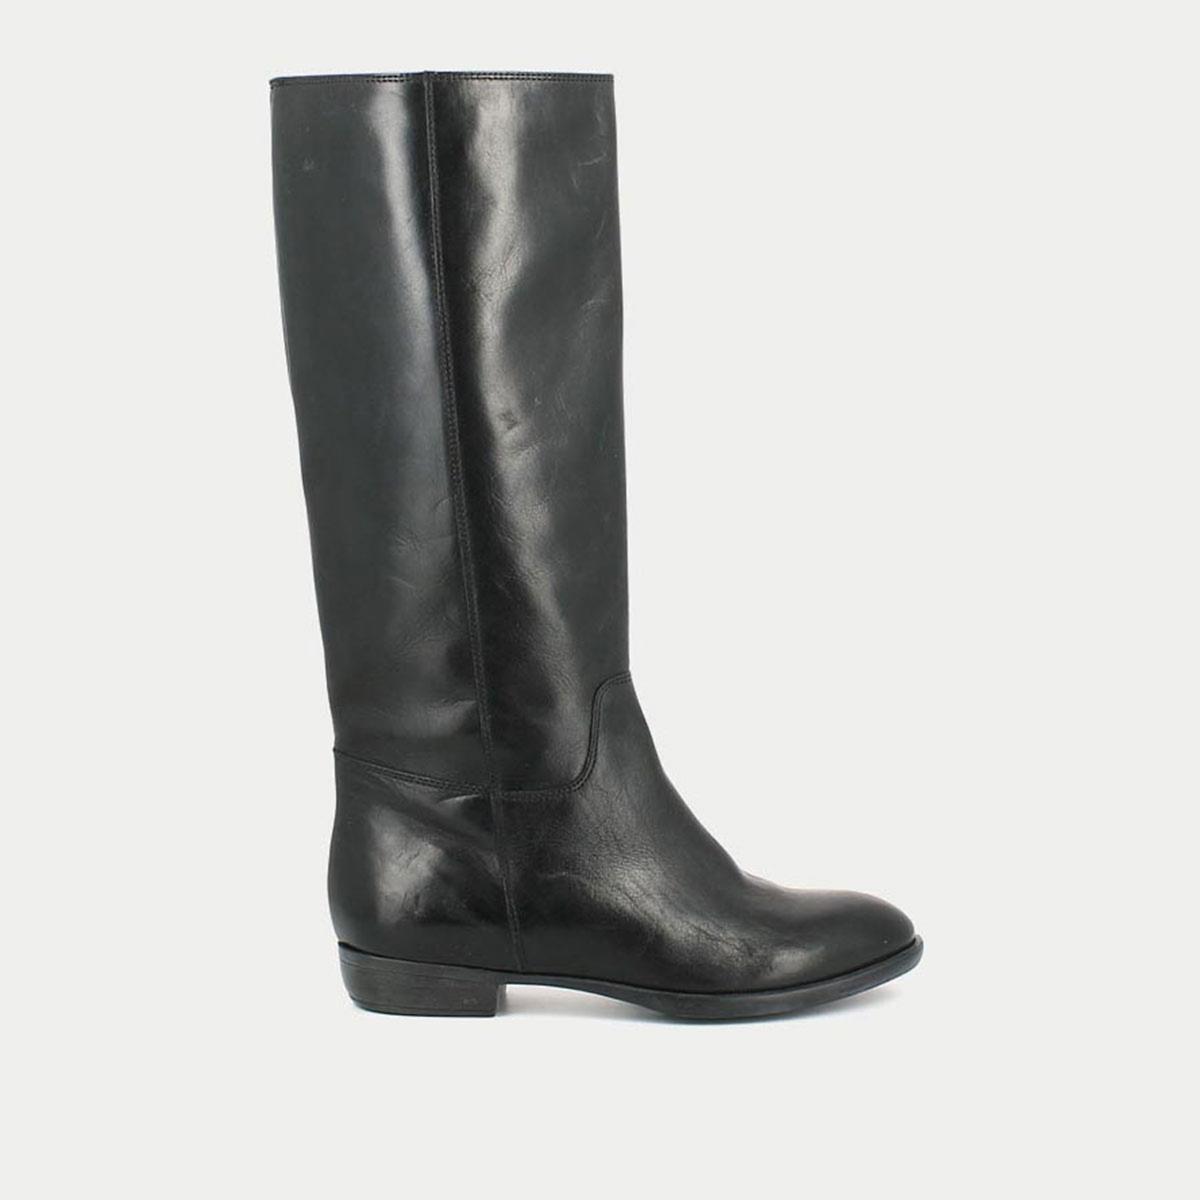 Сапоги кожаные на плоском каблуке 1137